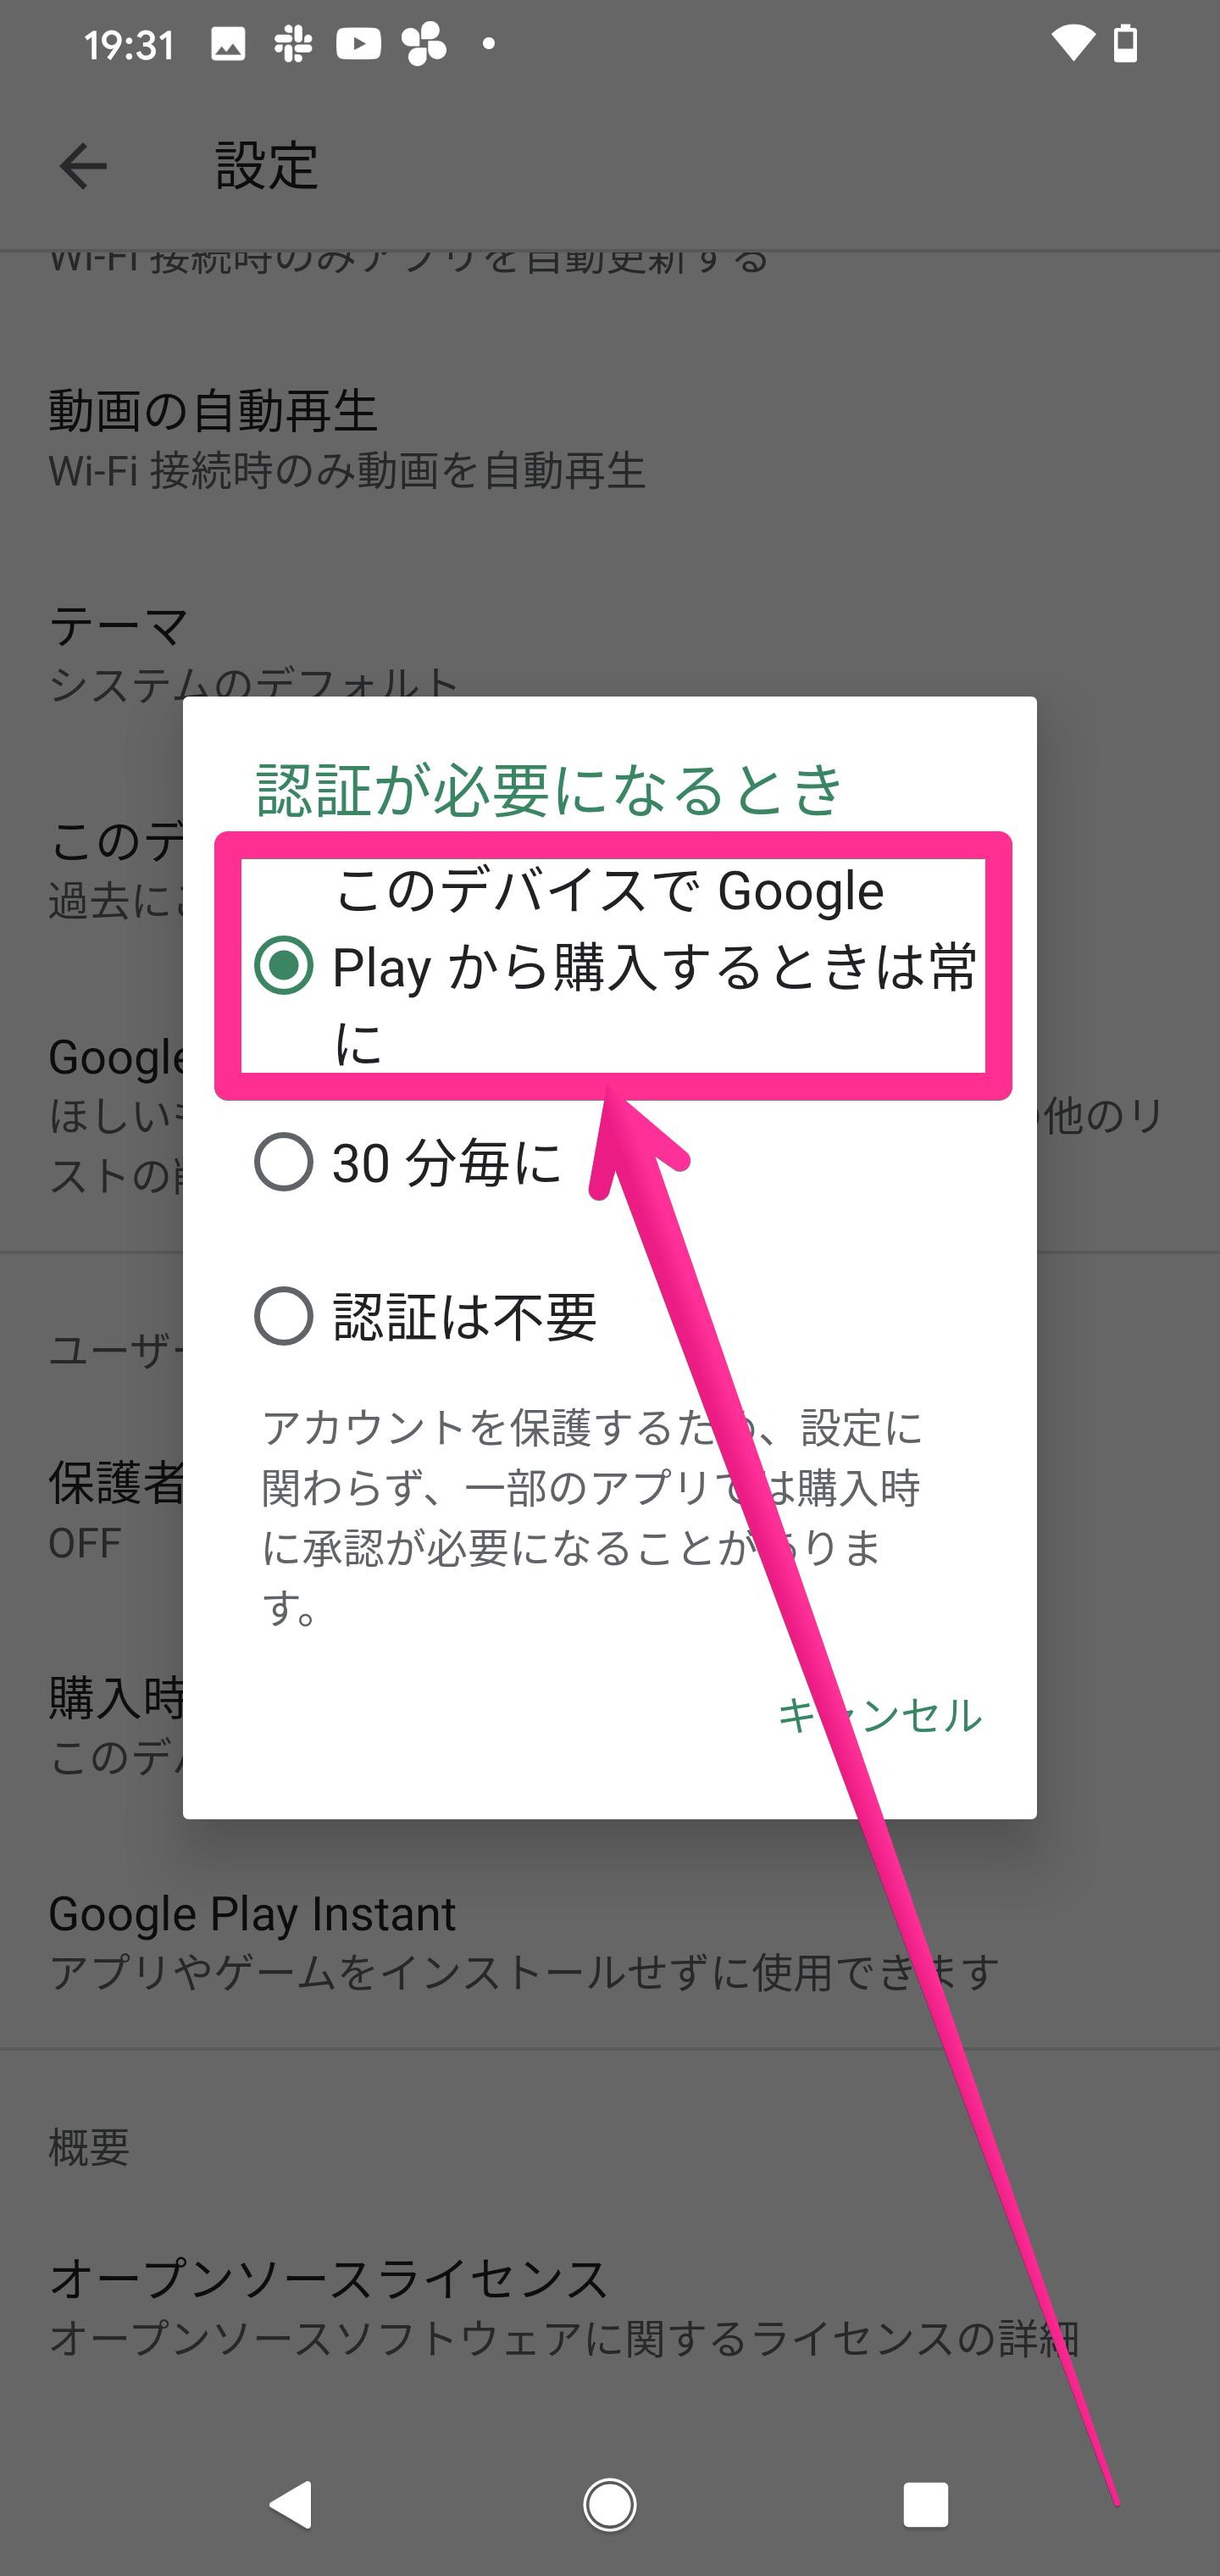 Google Playストアアプリ購入の制限